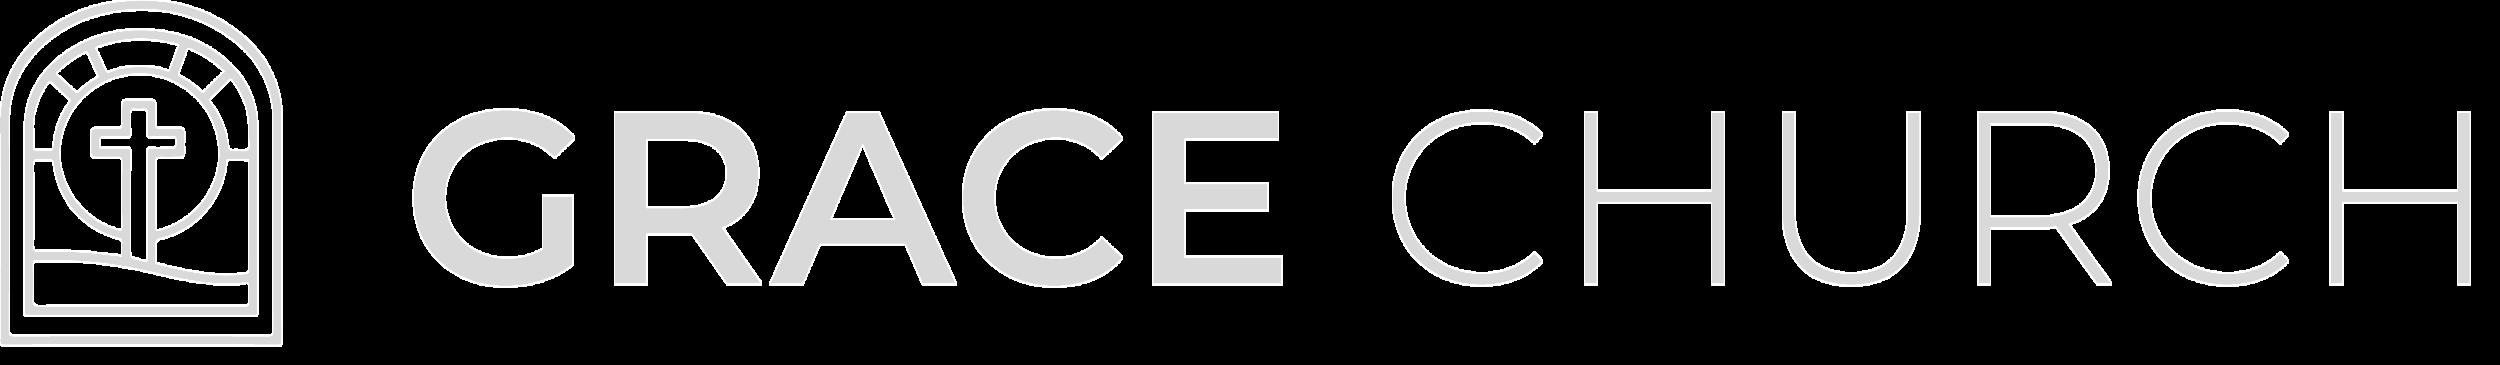 logoacrosslightgrey.png